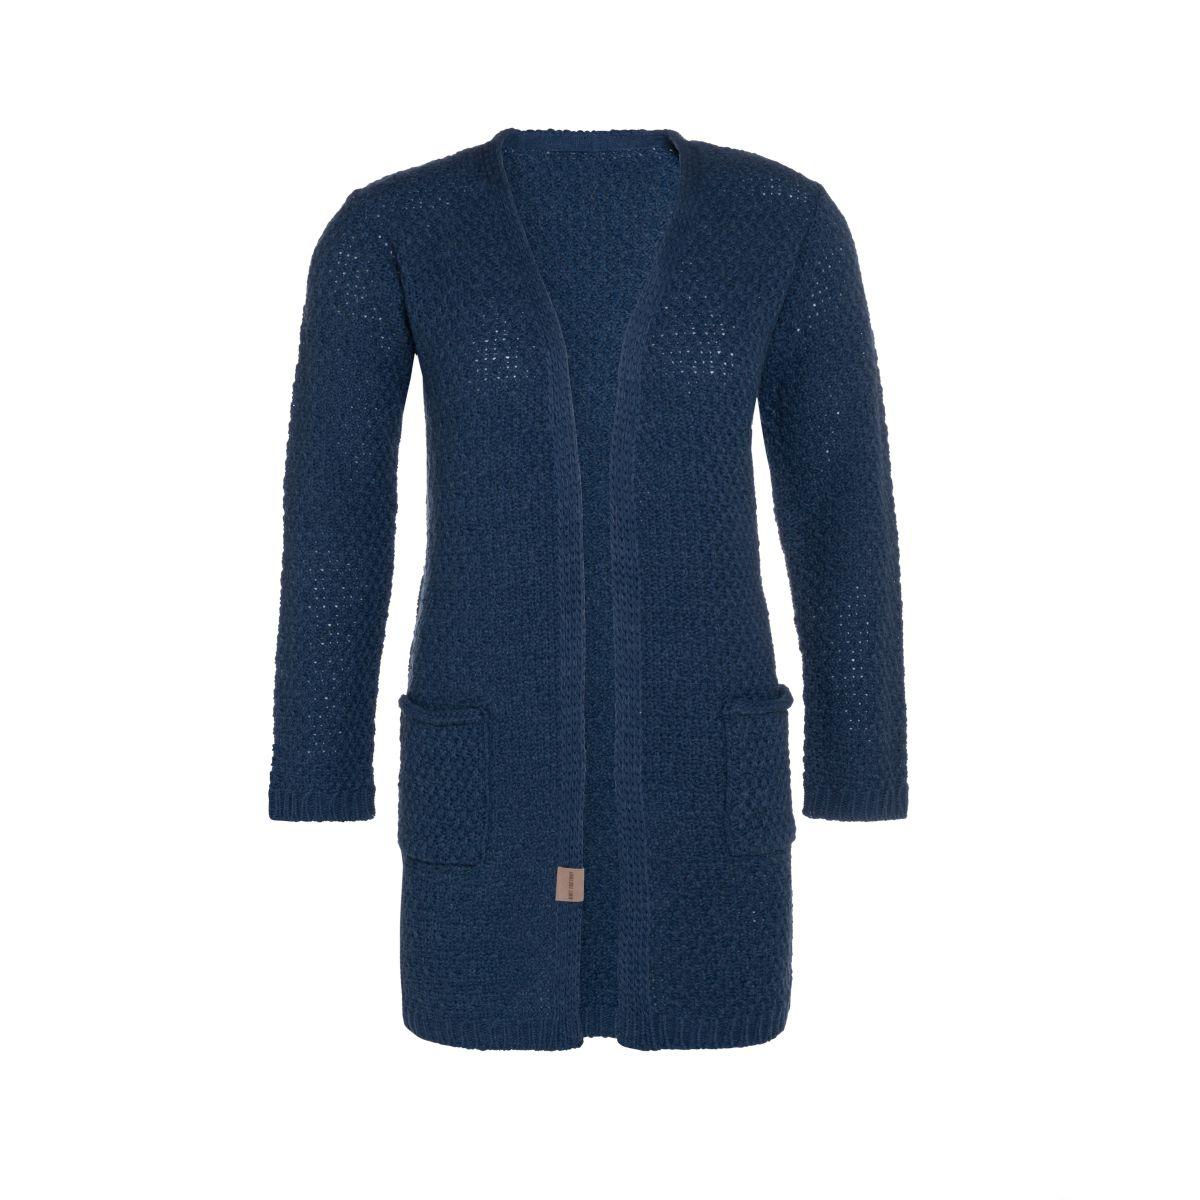 knit factory kf13308101351 luna vest jeans 4042 1